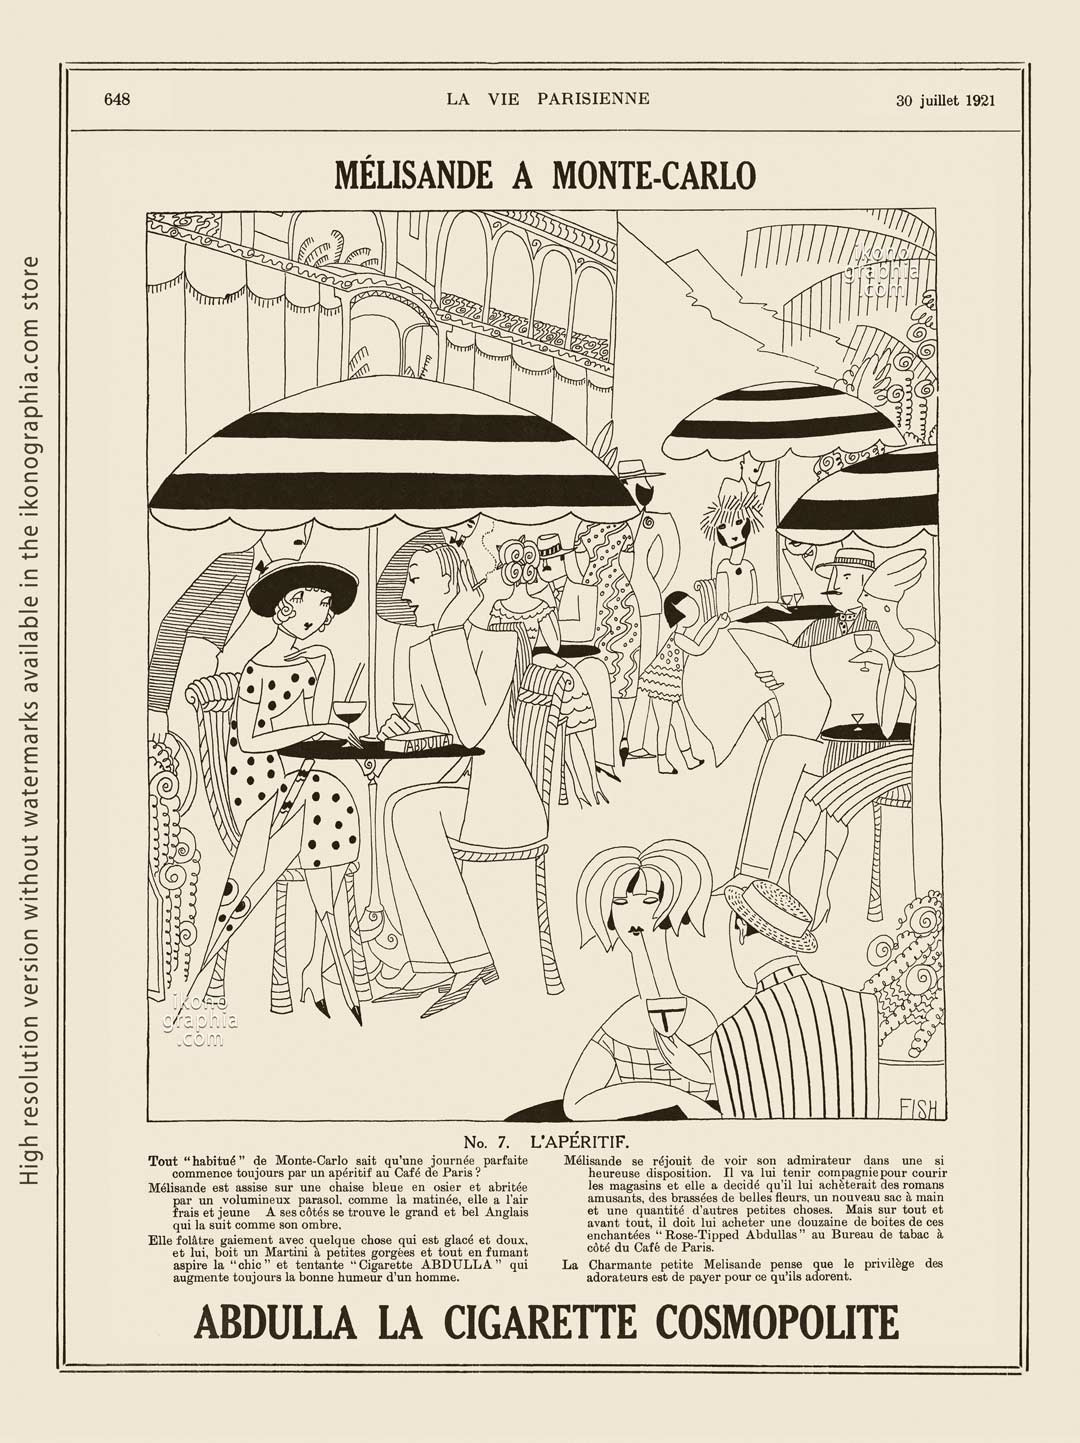 Abdulla Cigarettes Ad - Melisande at Montecarlo. No. 7. L'APÉRITIF. La Vie Parisienne. July 30, 1921. Artwork by Anne Harriet Fish.